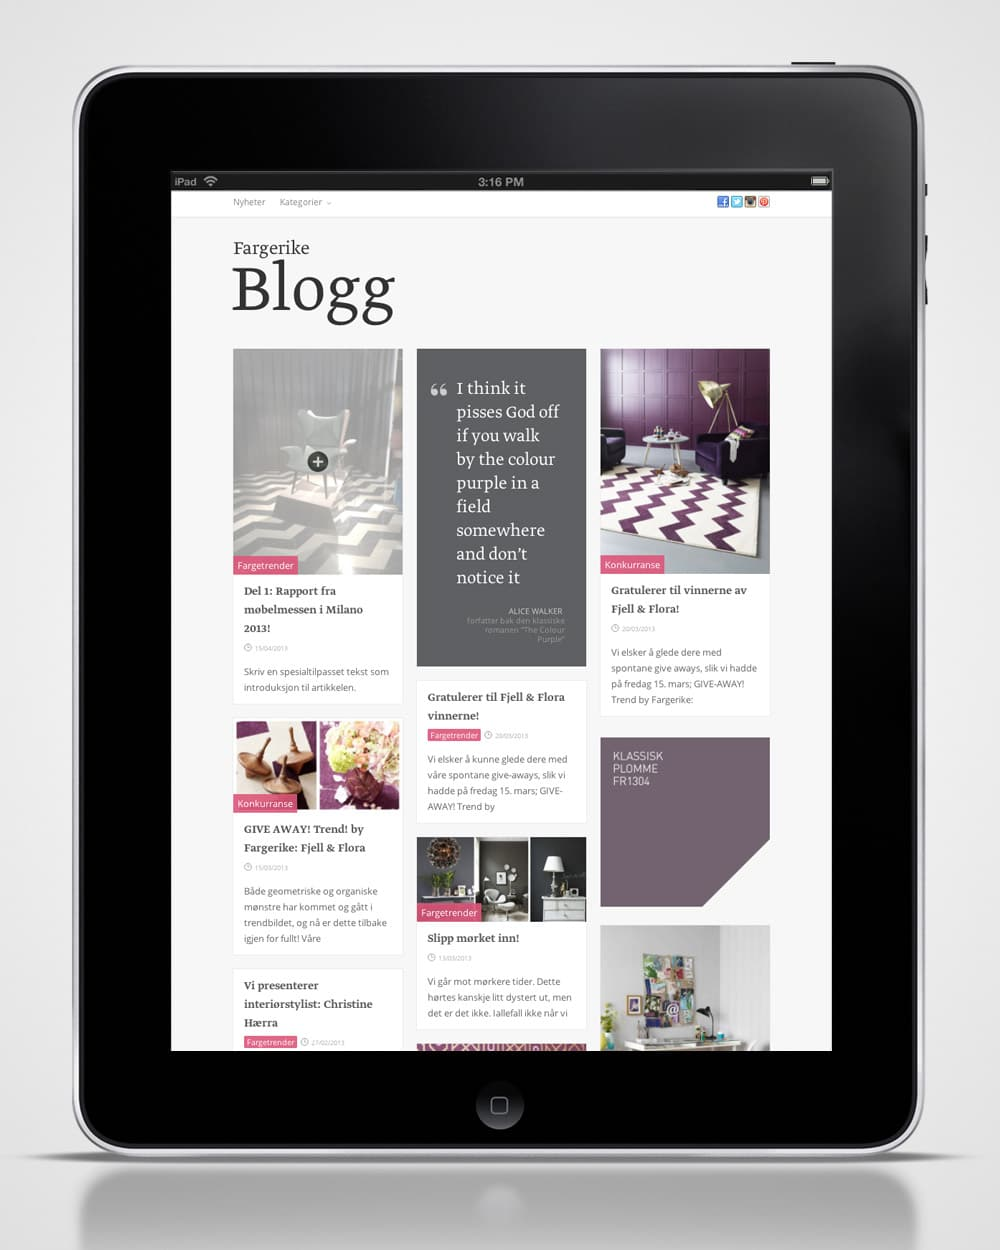 Fargerike / Blogg - ipad